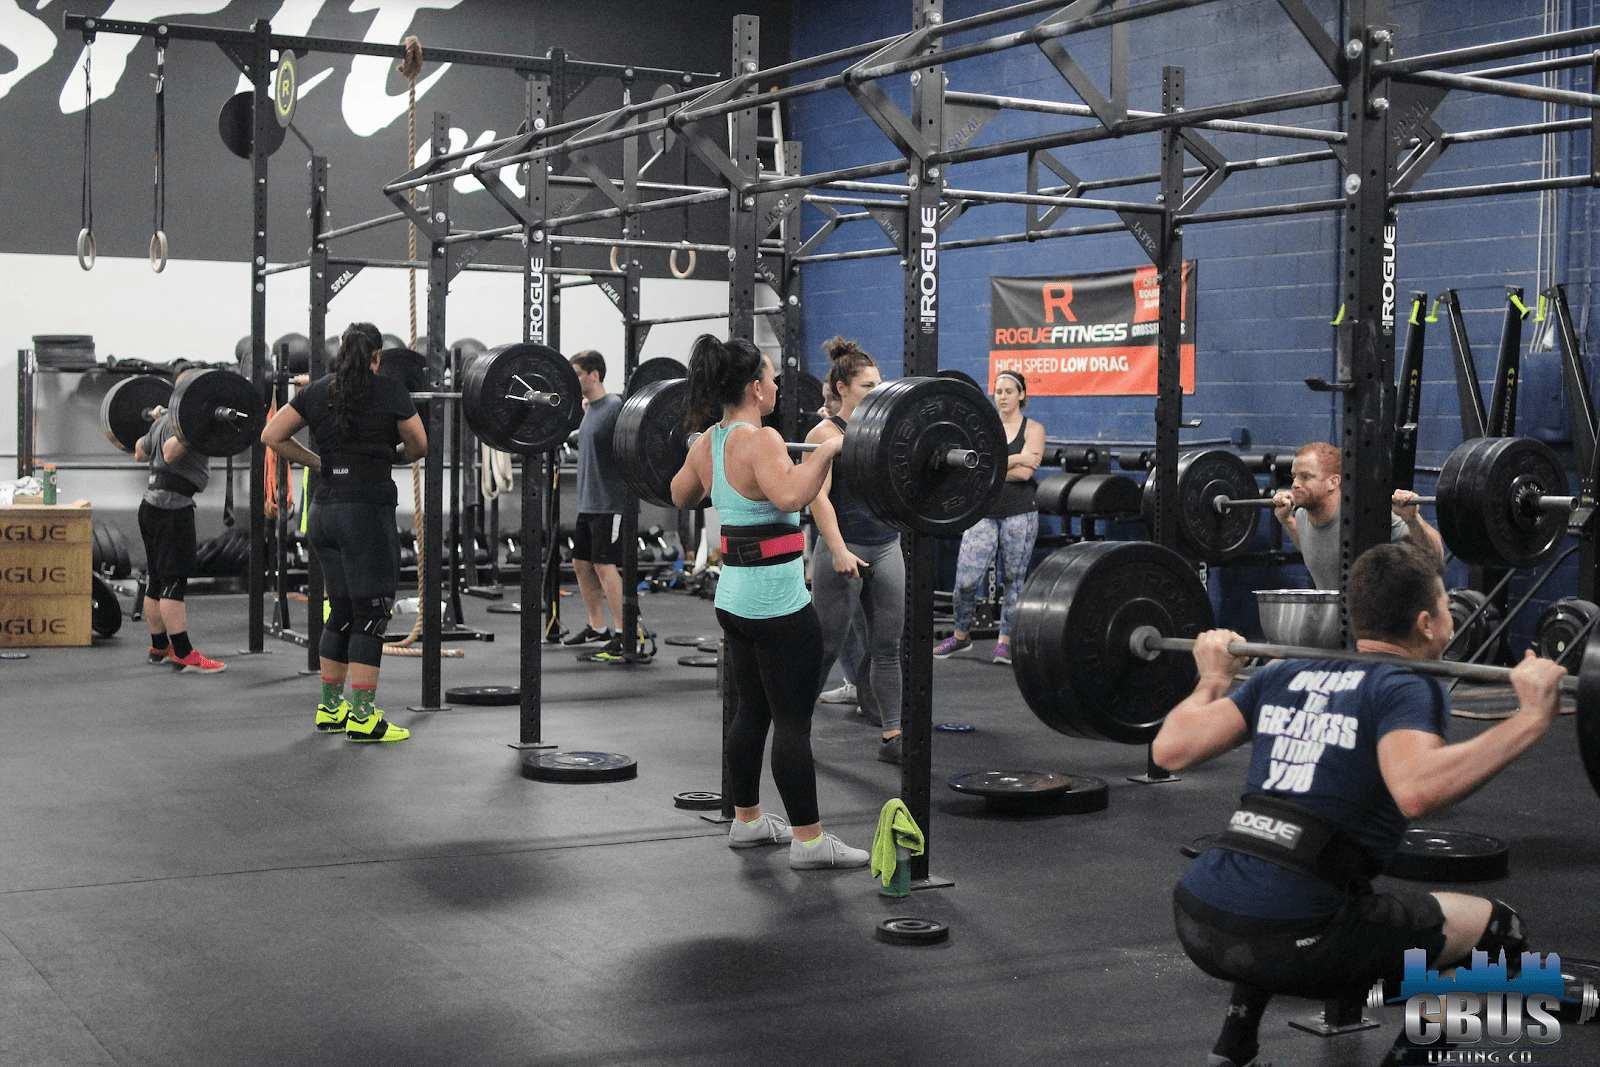 Group of athletes power squatting